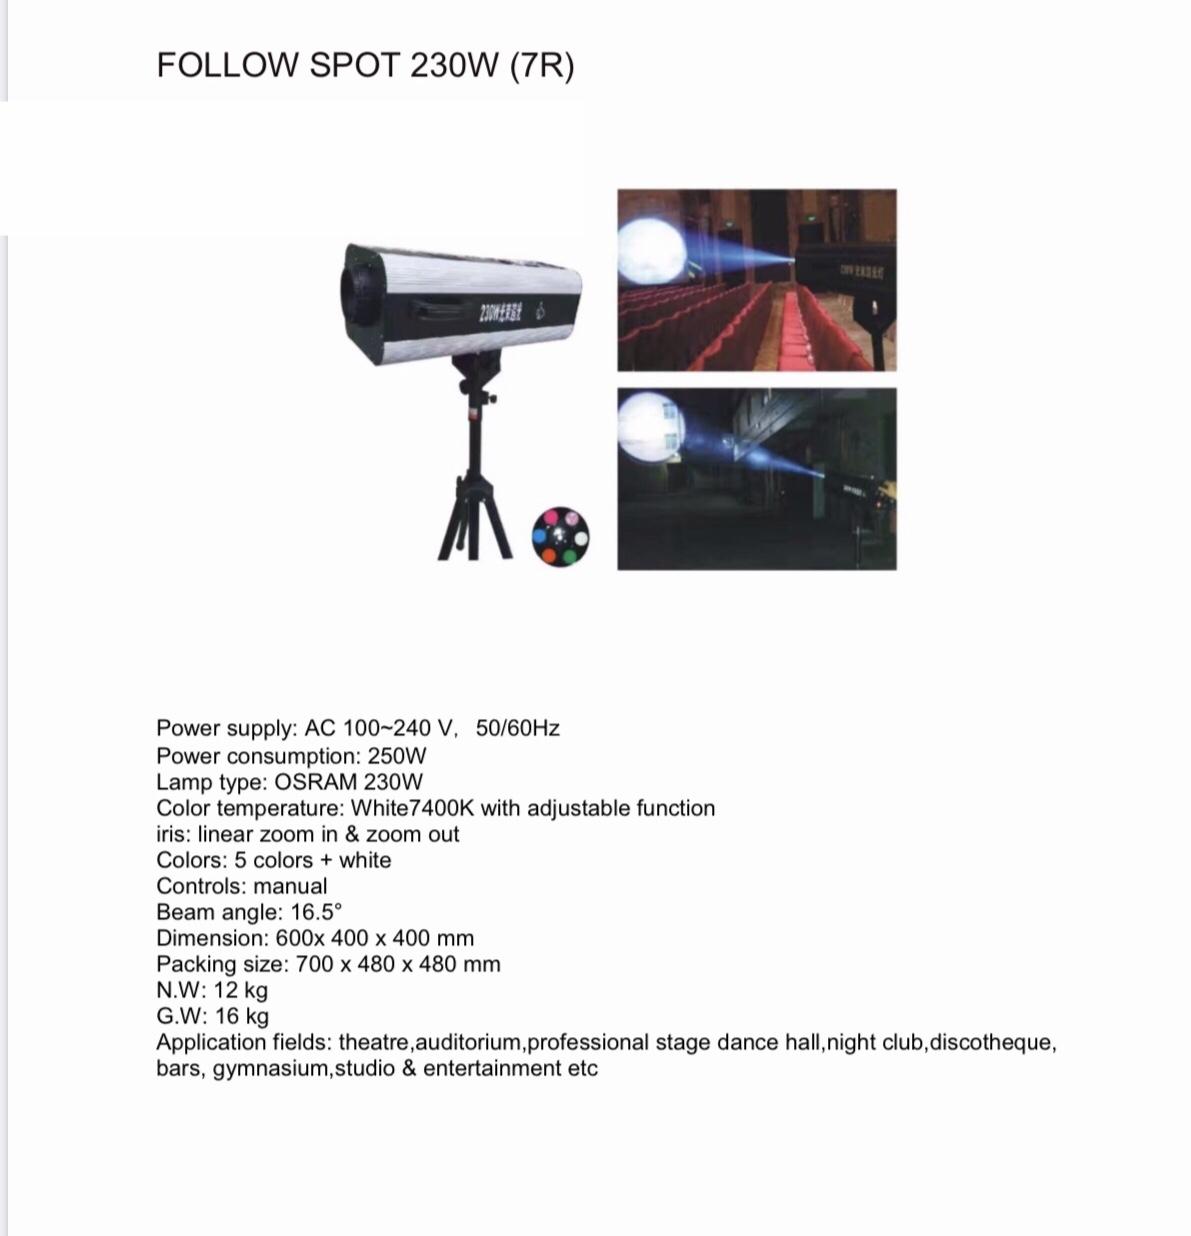 FOLLOW  SPOT 230w 7R